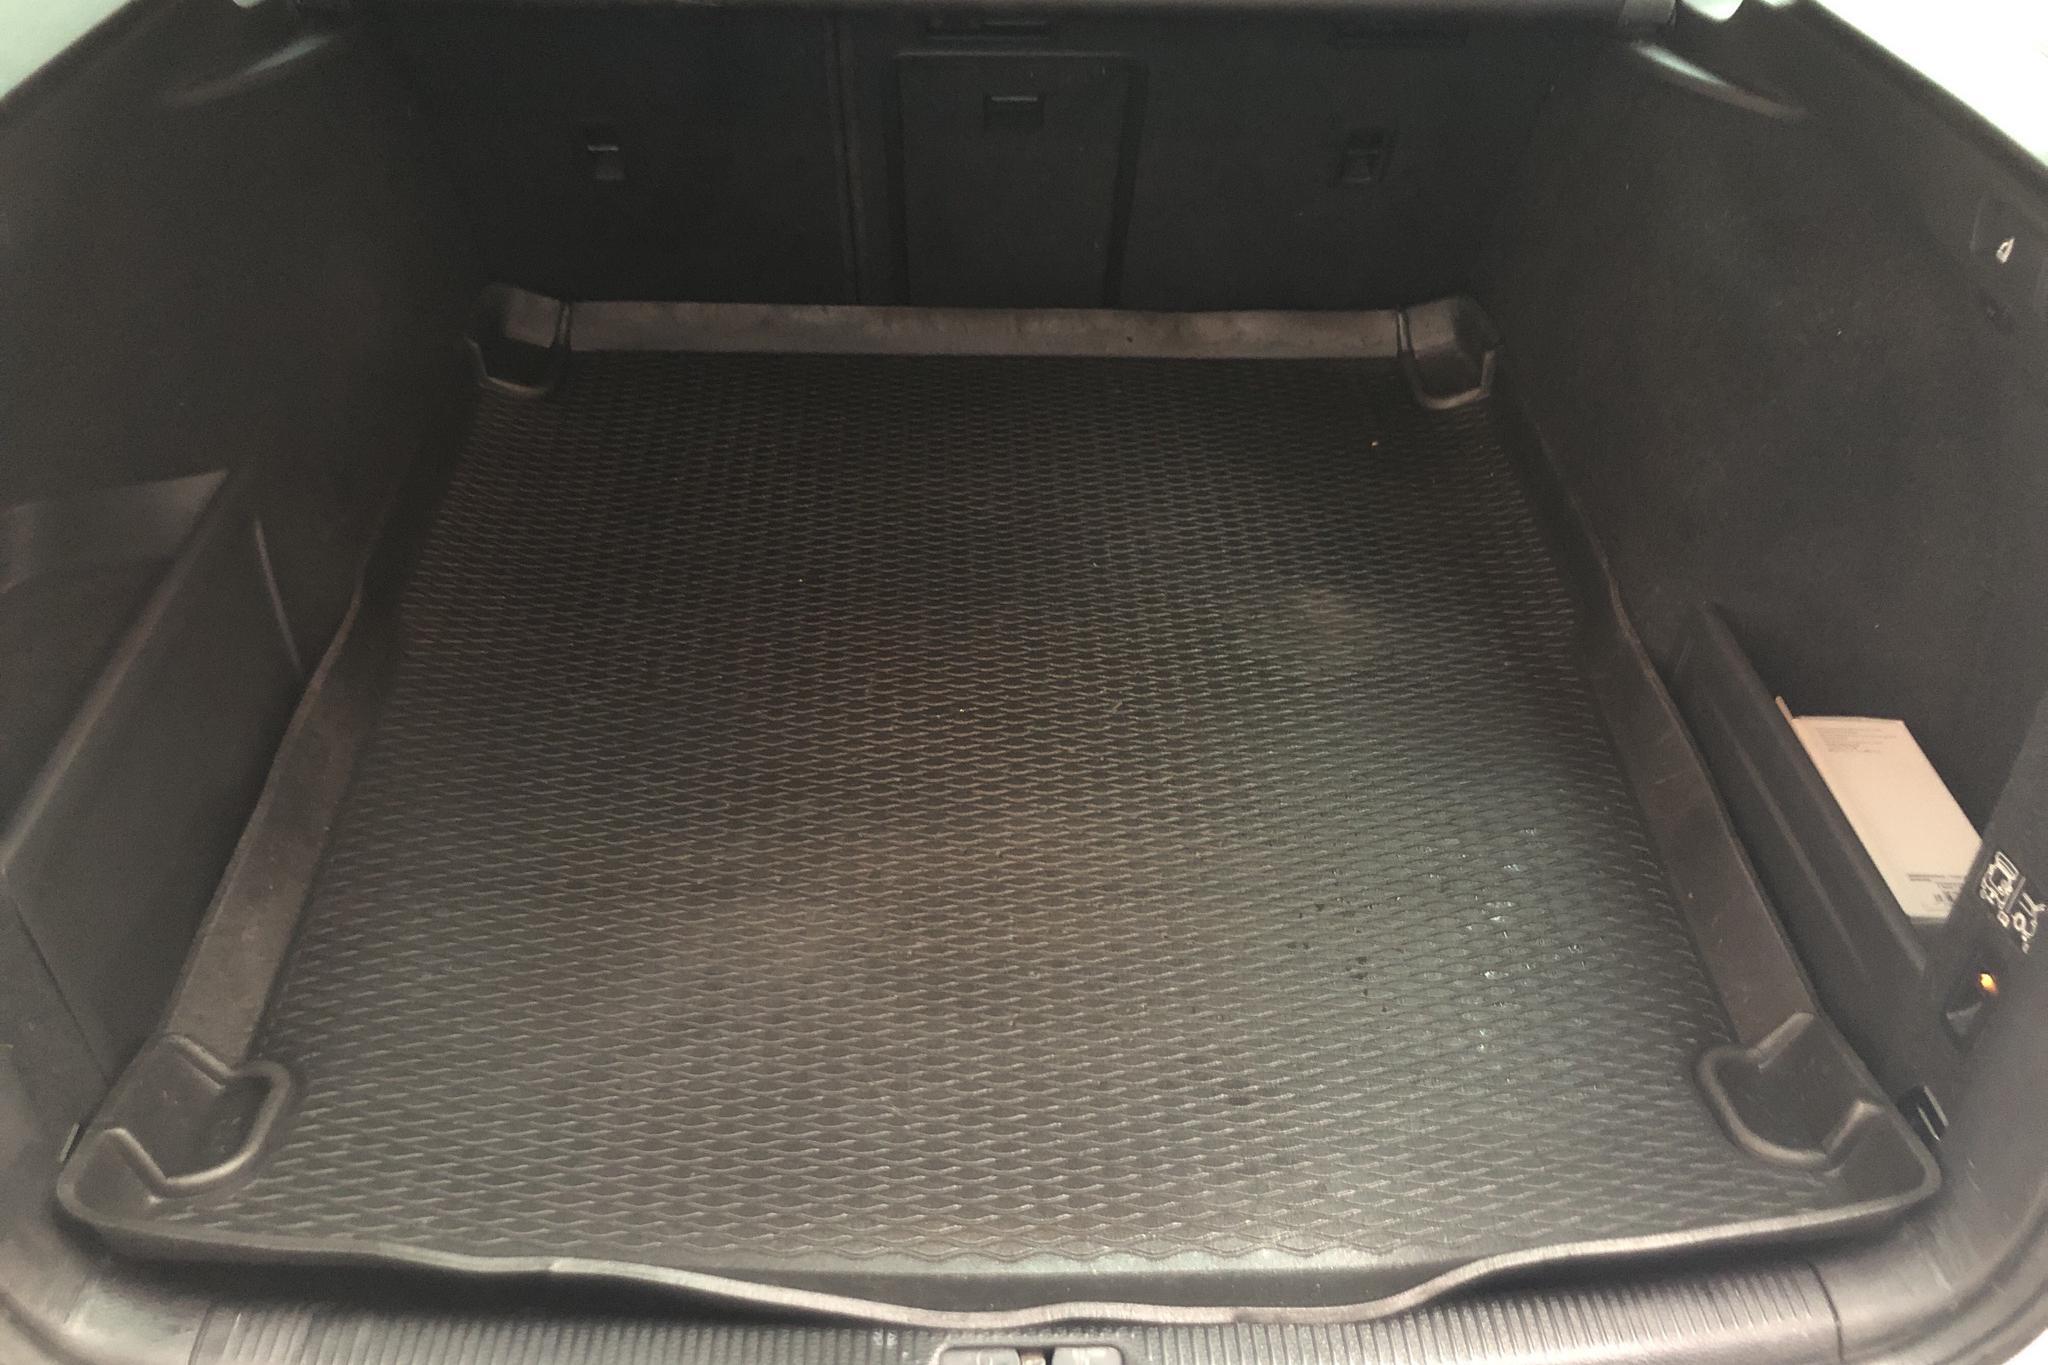 VW Passat 2.0 TDI BlueMotion Technology Variant 4Motion (177hk) - 12 749 mil - Automat - vit - 2014